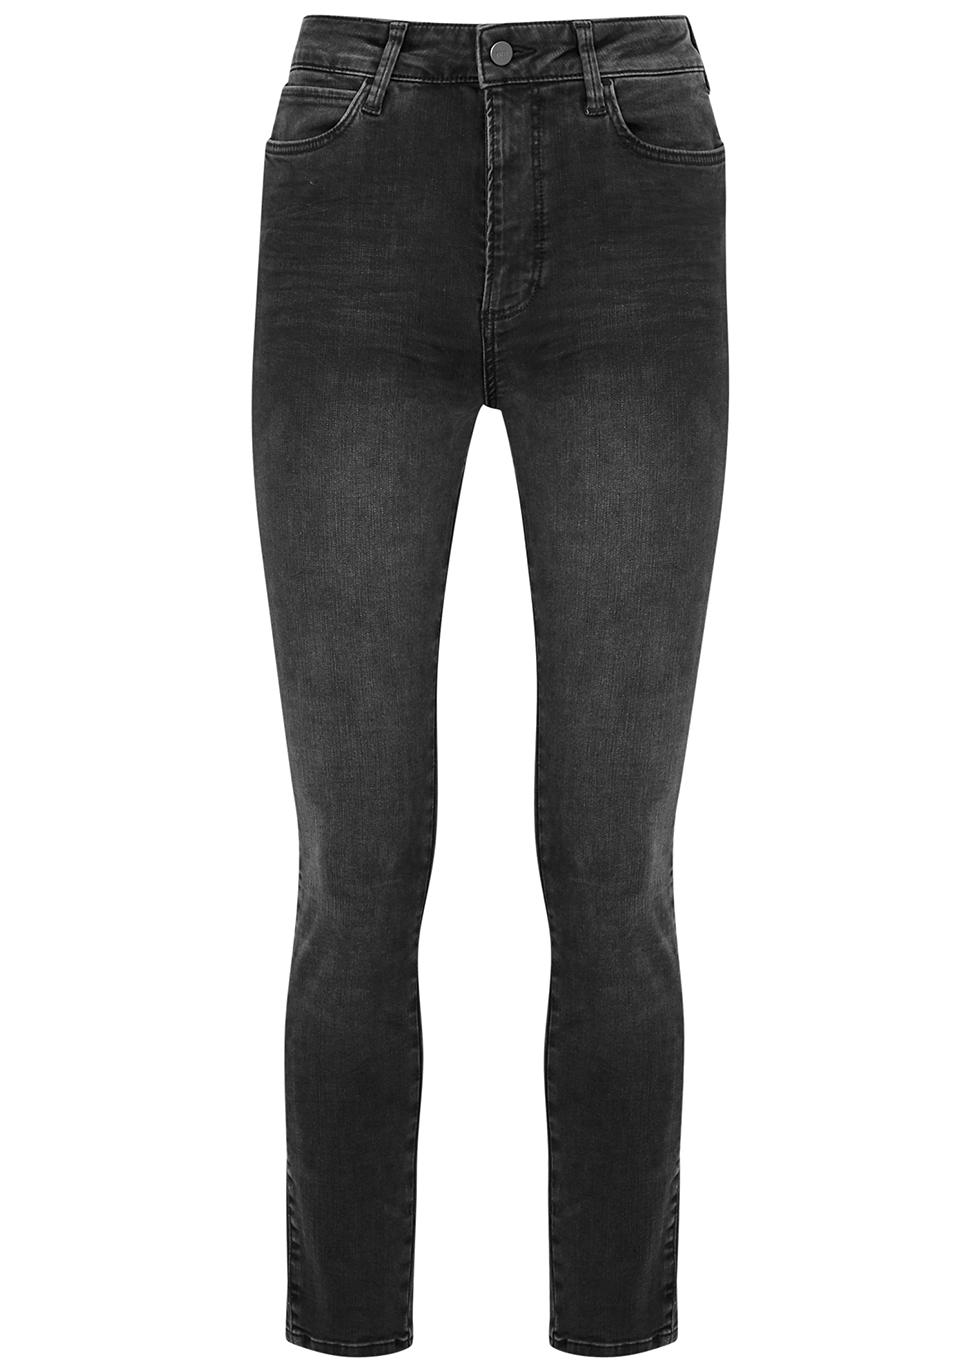 Margot dark grey skinny jeans